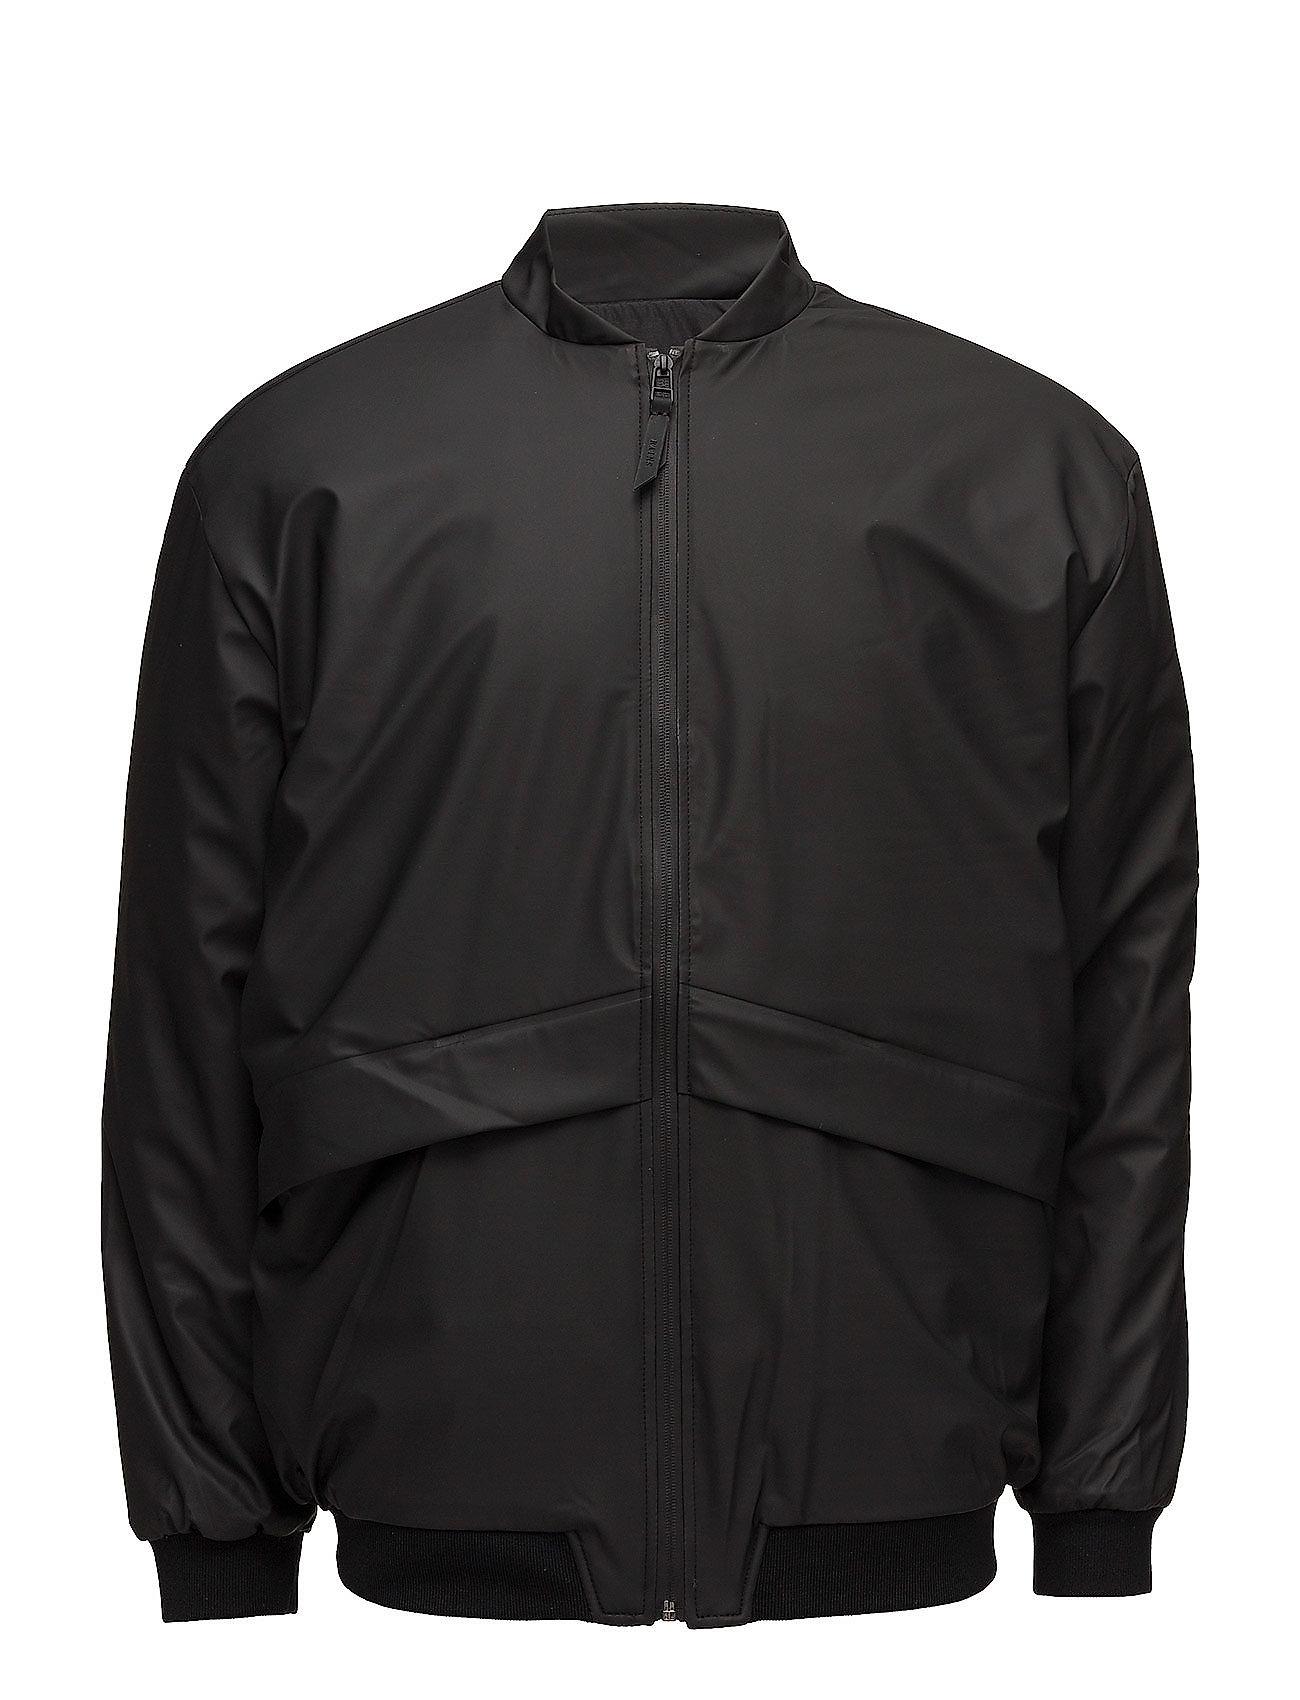 rains B15 jacket på boozt.com dk